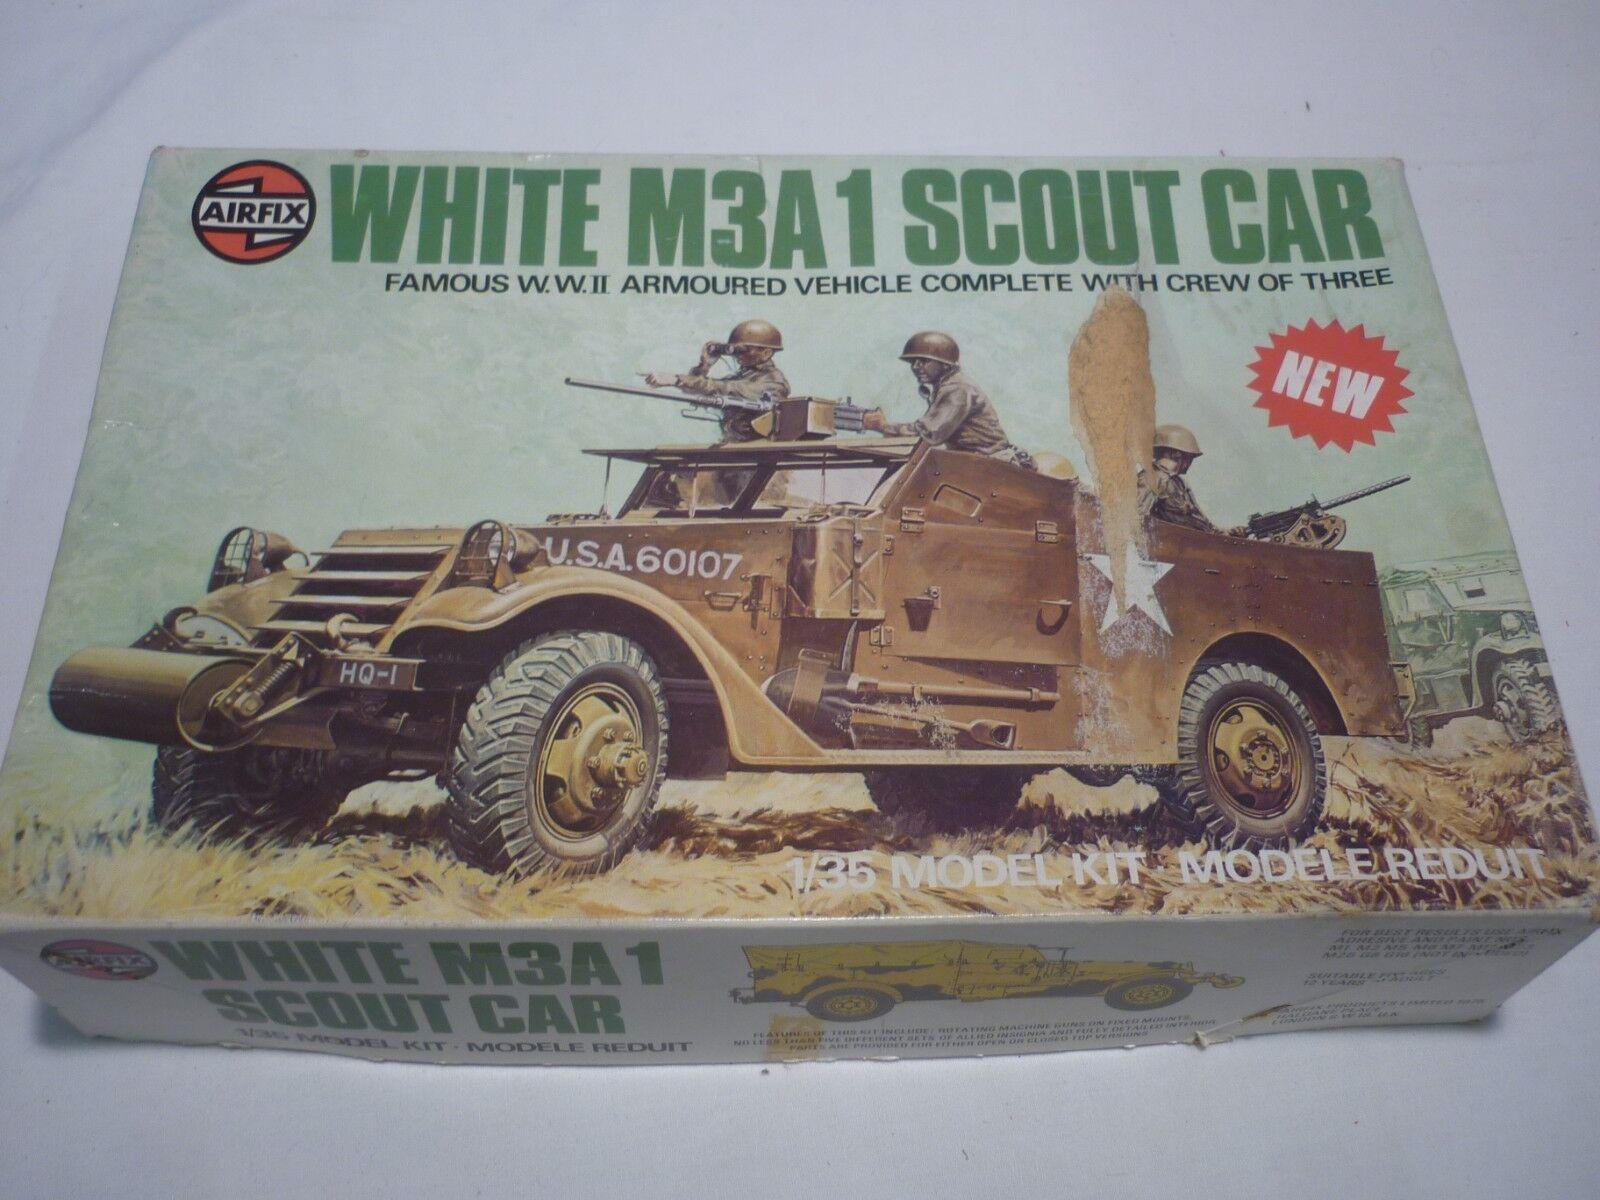 A vintage Airfix un made plastic kit of a White M3A-1 Scout car,  boxed